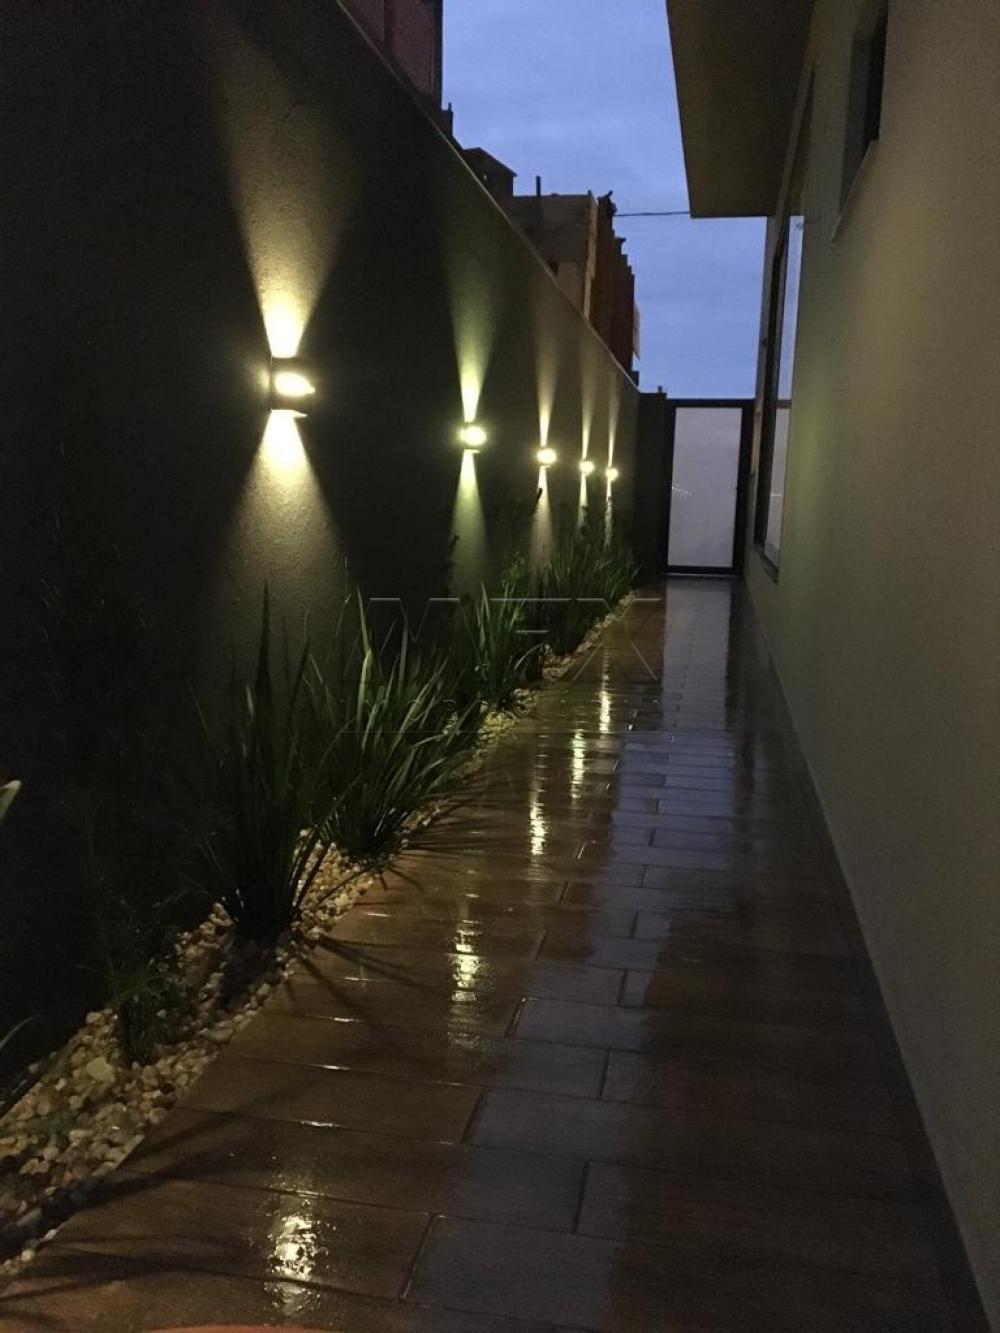 Comprar Casa / Condomínio em Bauru apenas R$ 1.600.000,00 - Foto 7